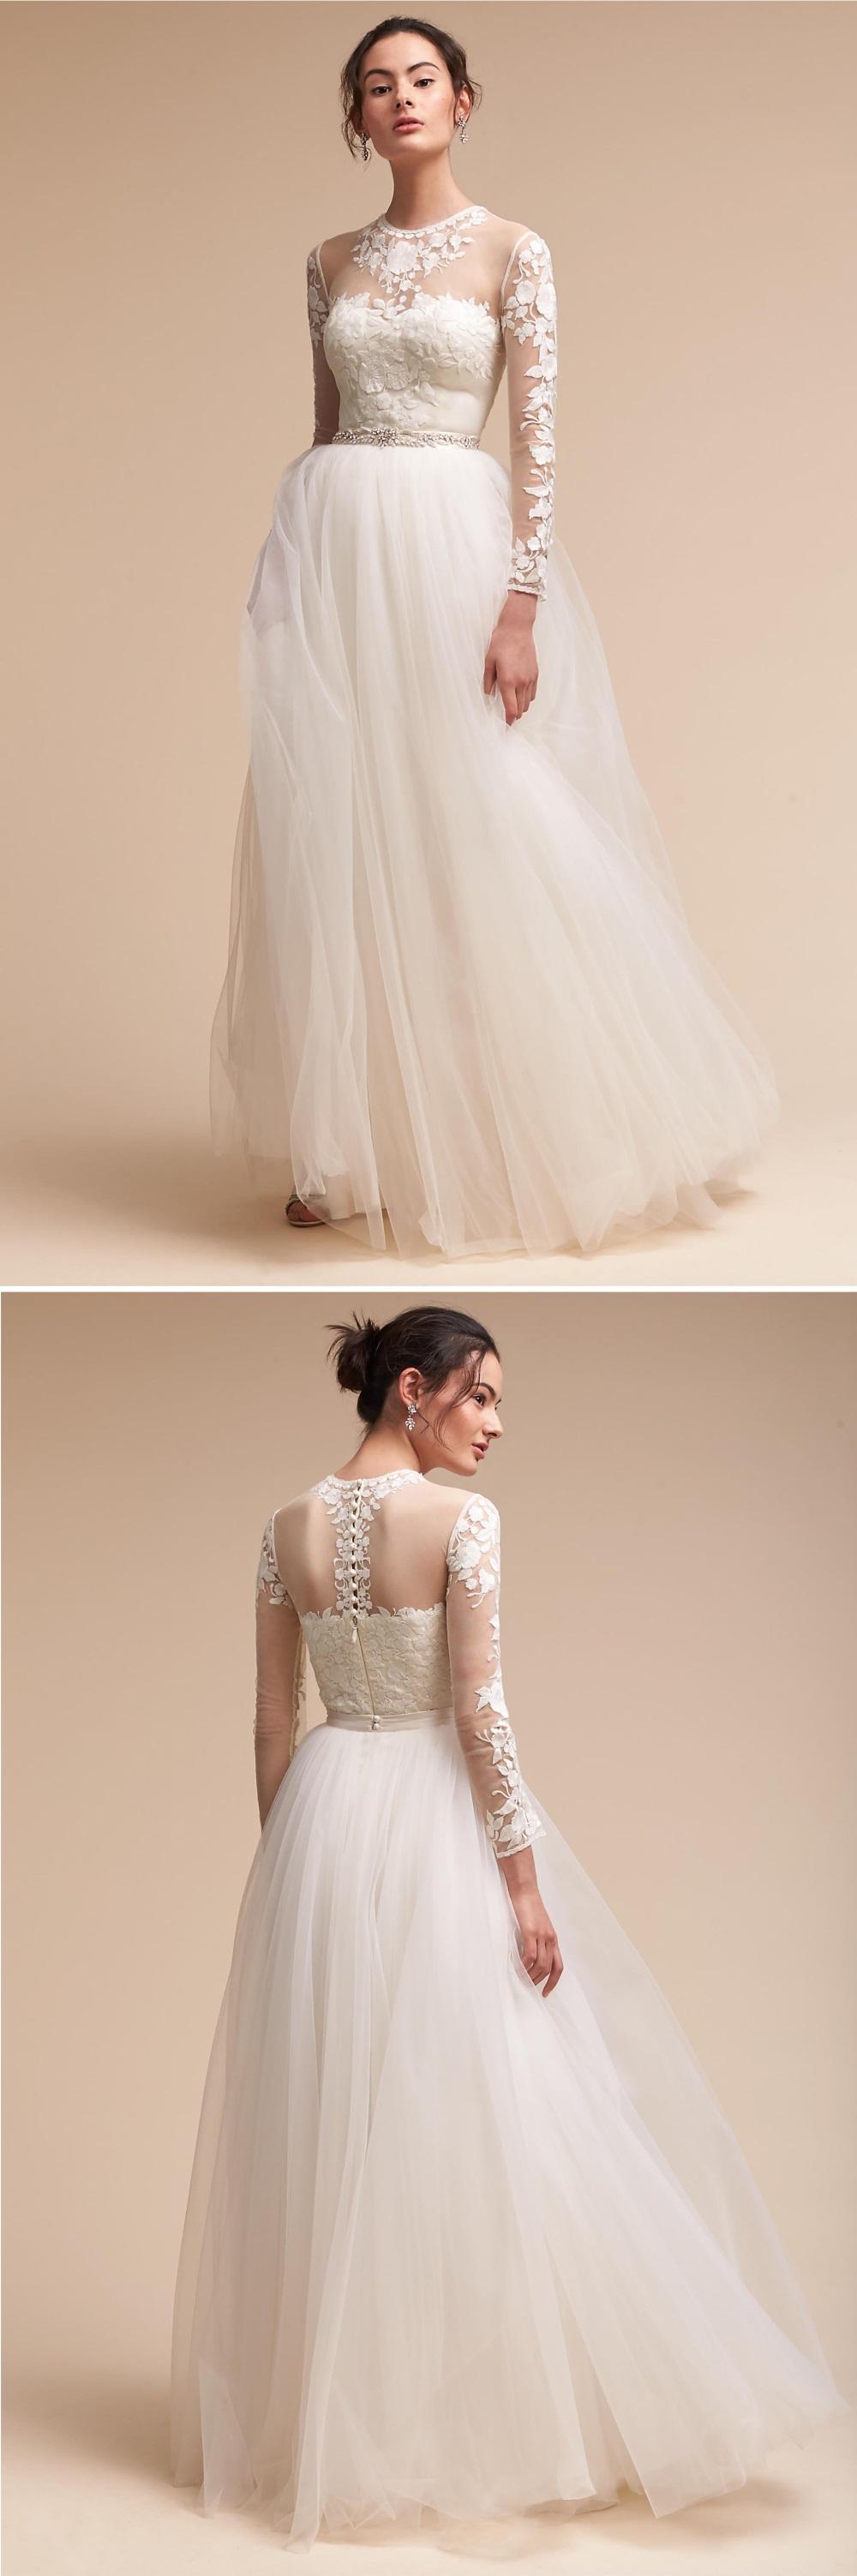 34++ Tulle wedding skirt separates ideas in 2021